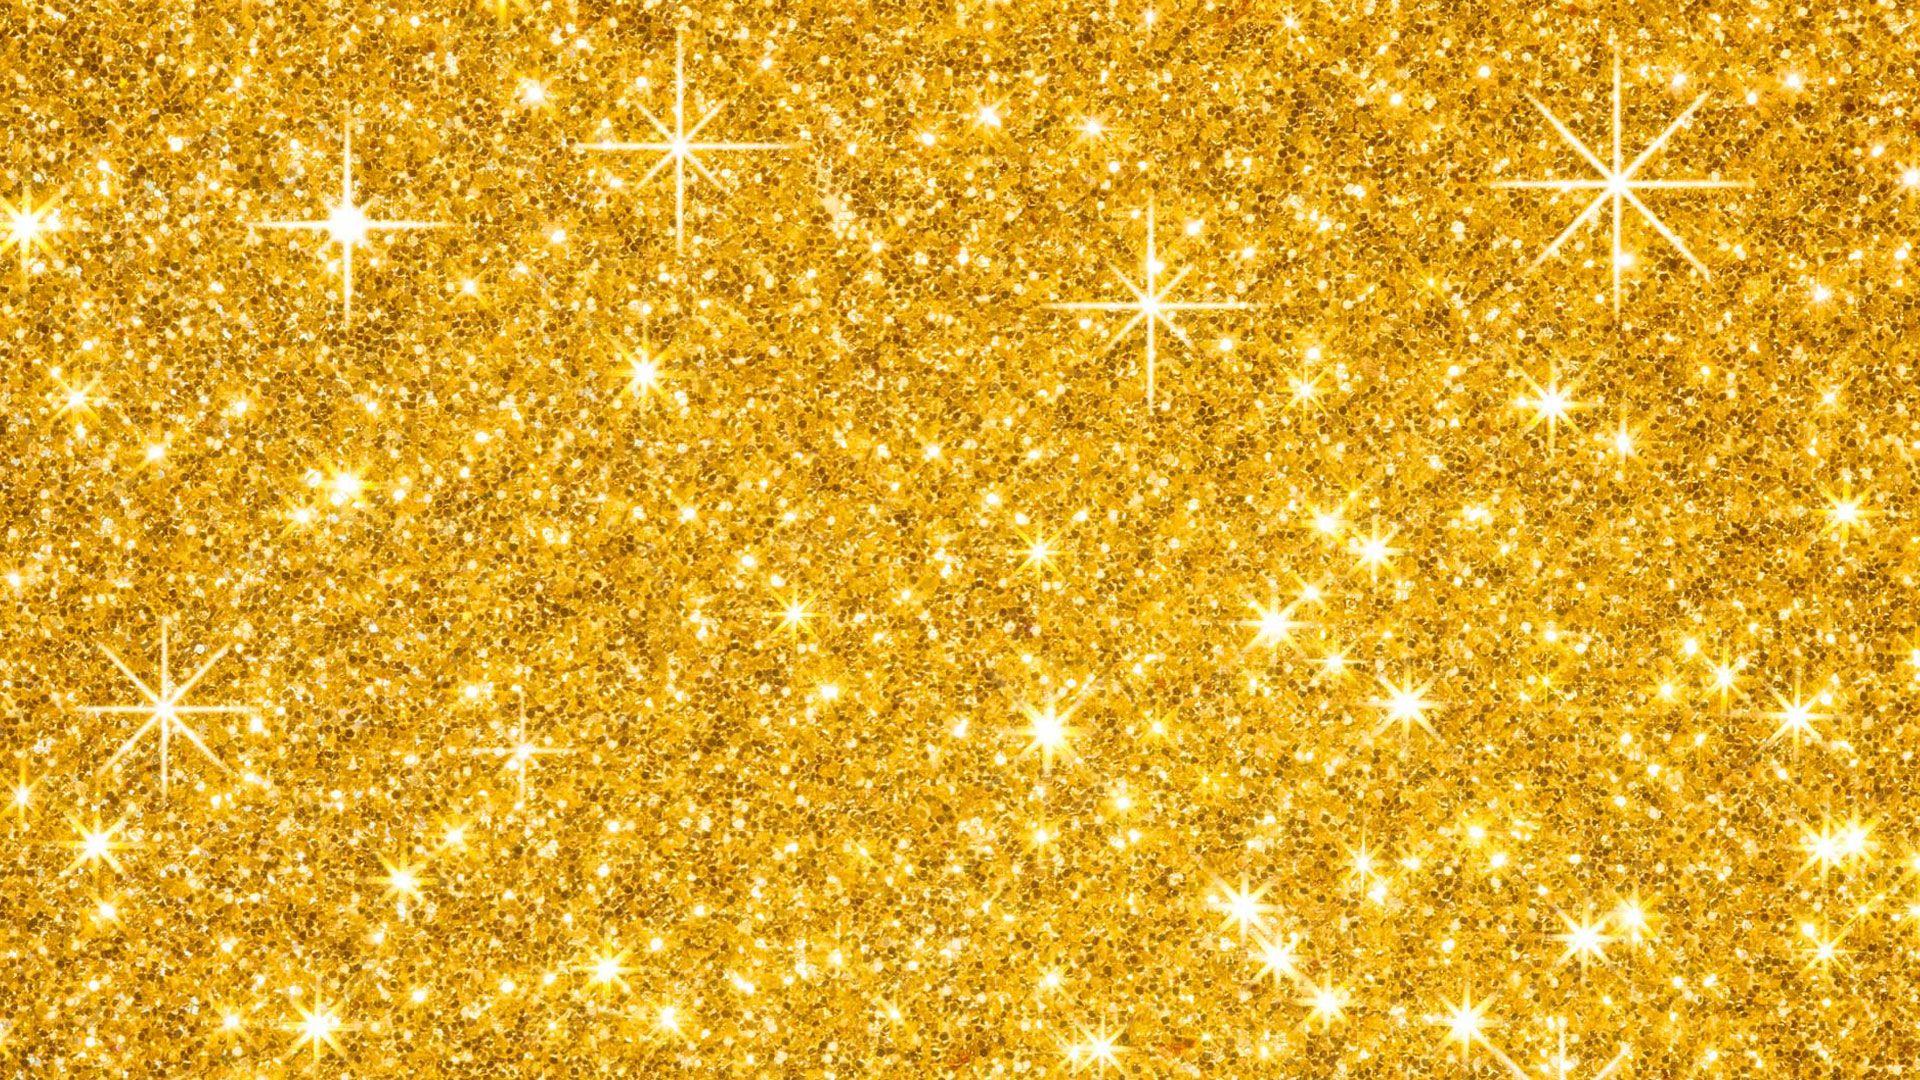 gold-glitter-1080p-background_1